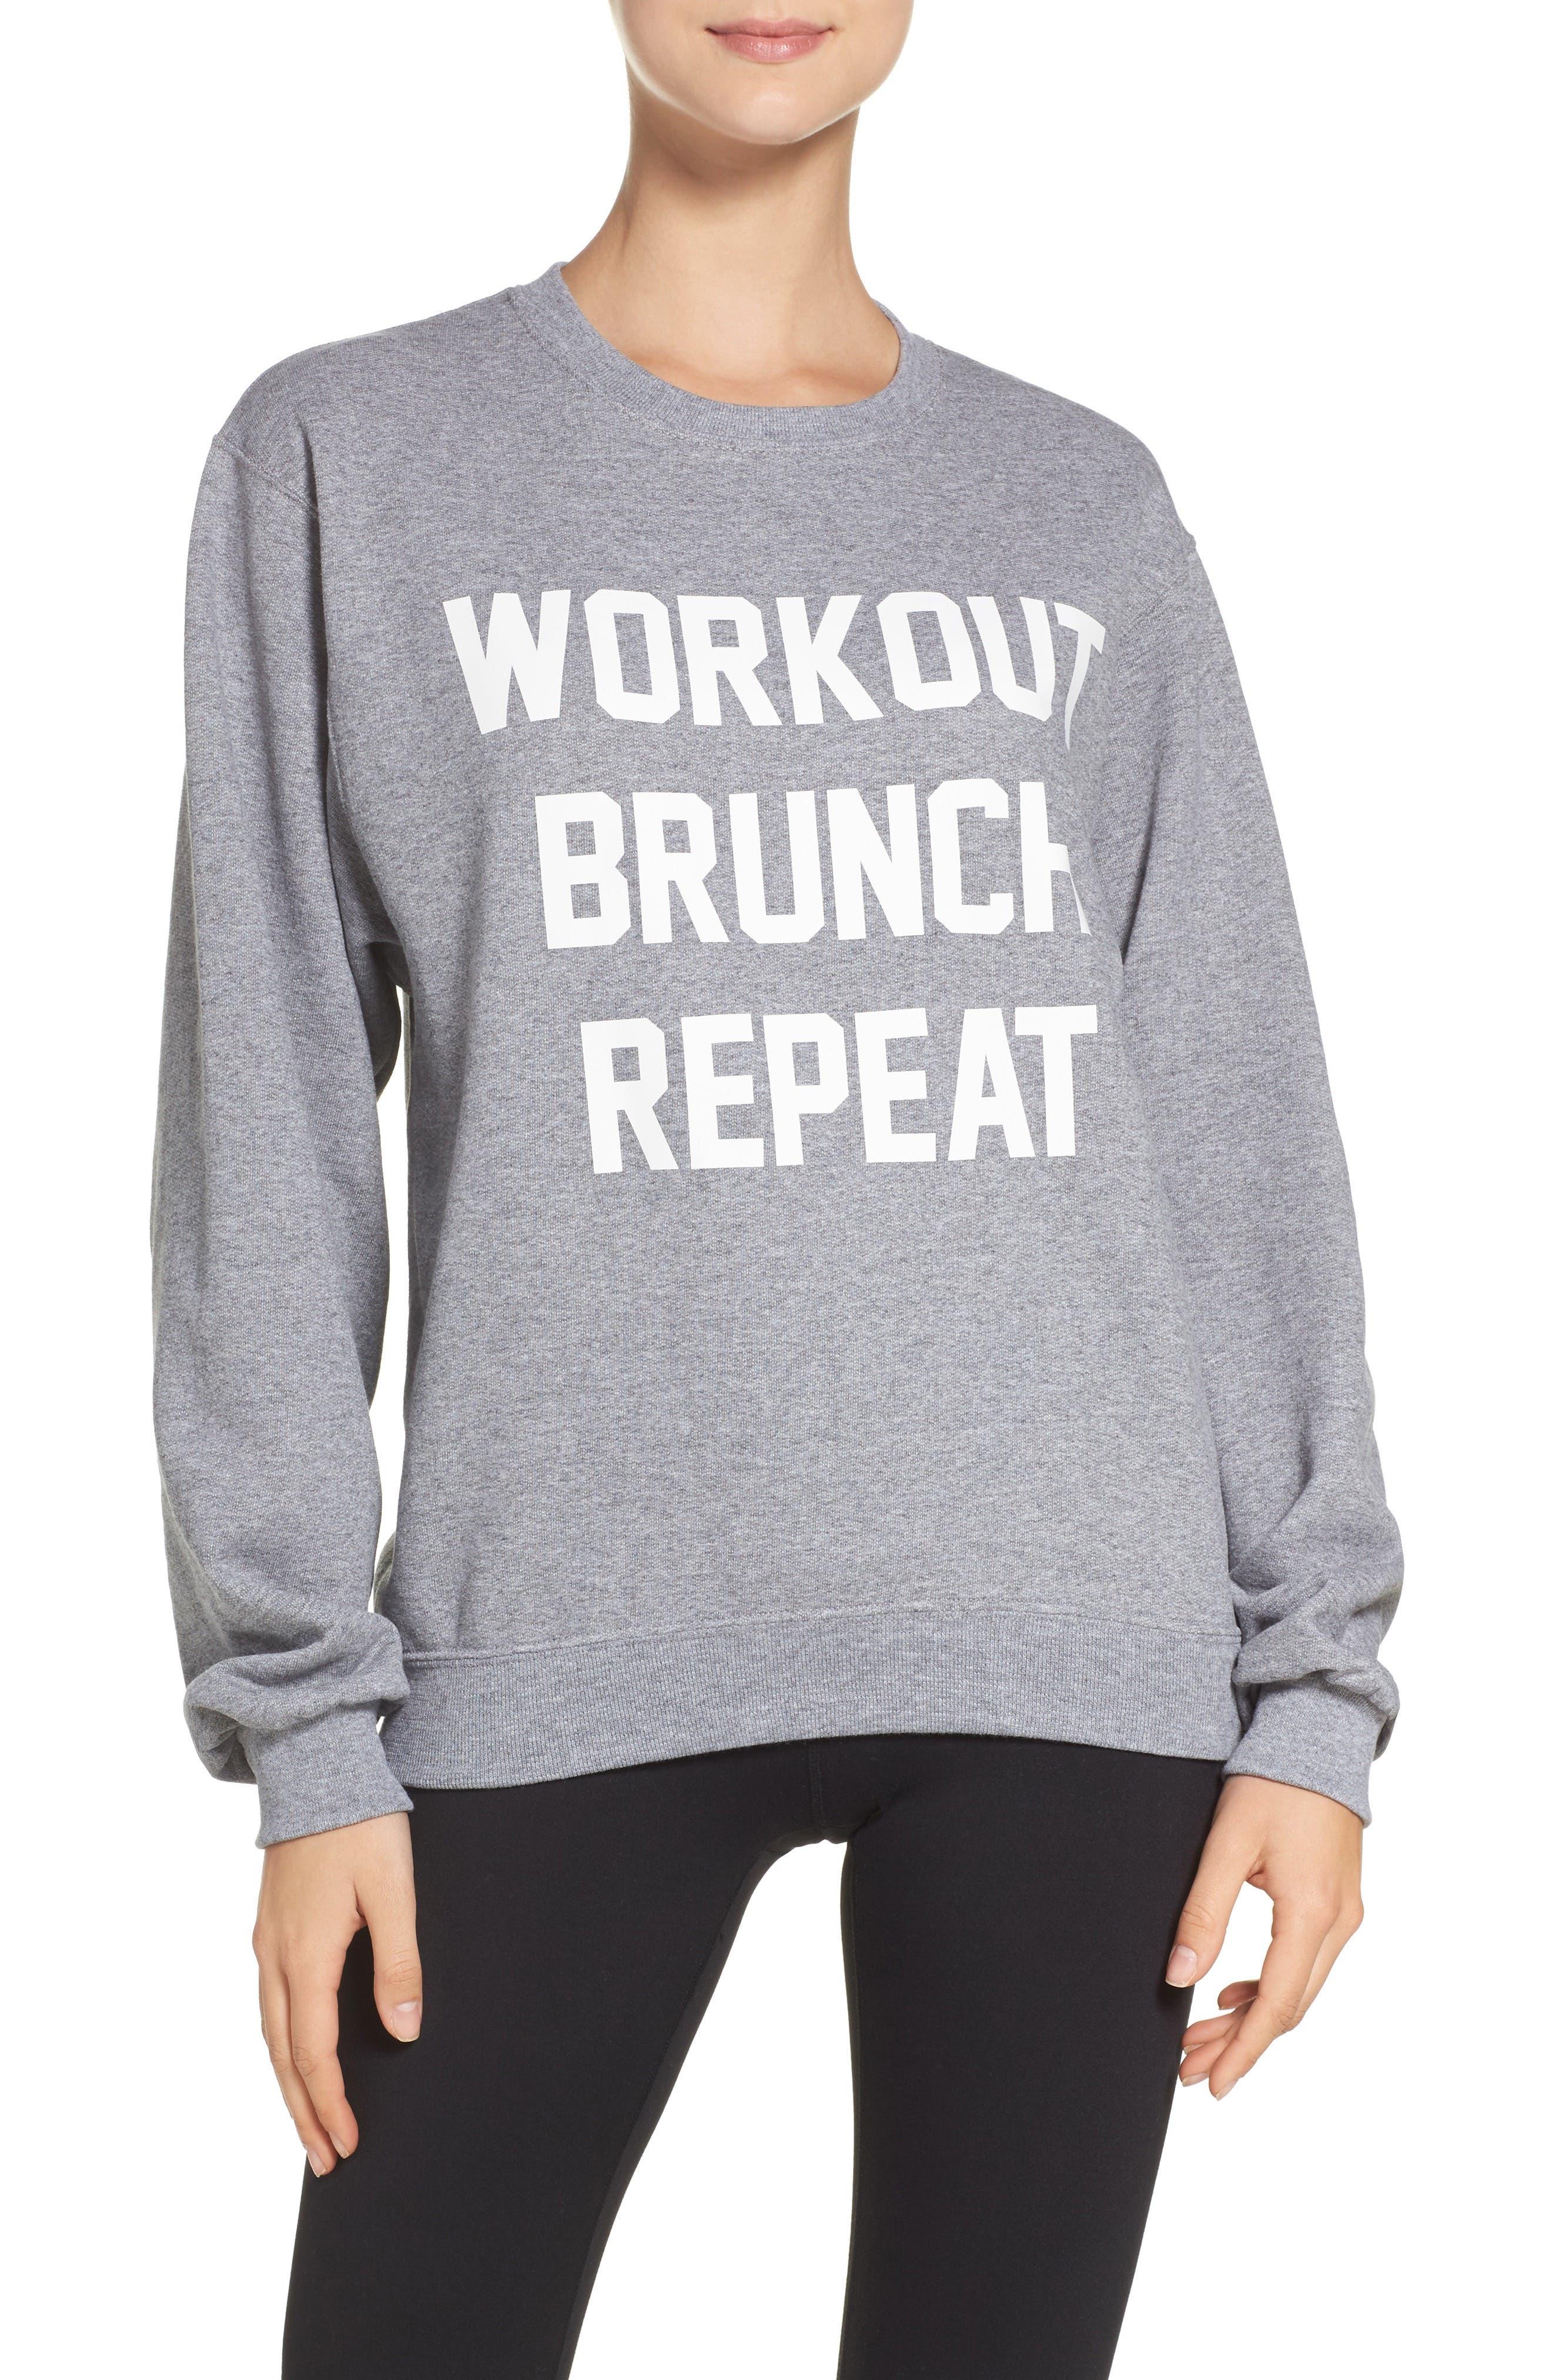 Workout Brunch Repeat Sweatshirt,                             Main thumbnail 1, color,                             Grey